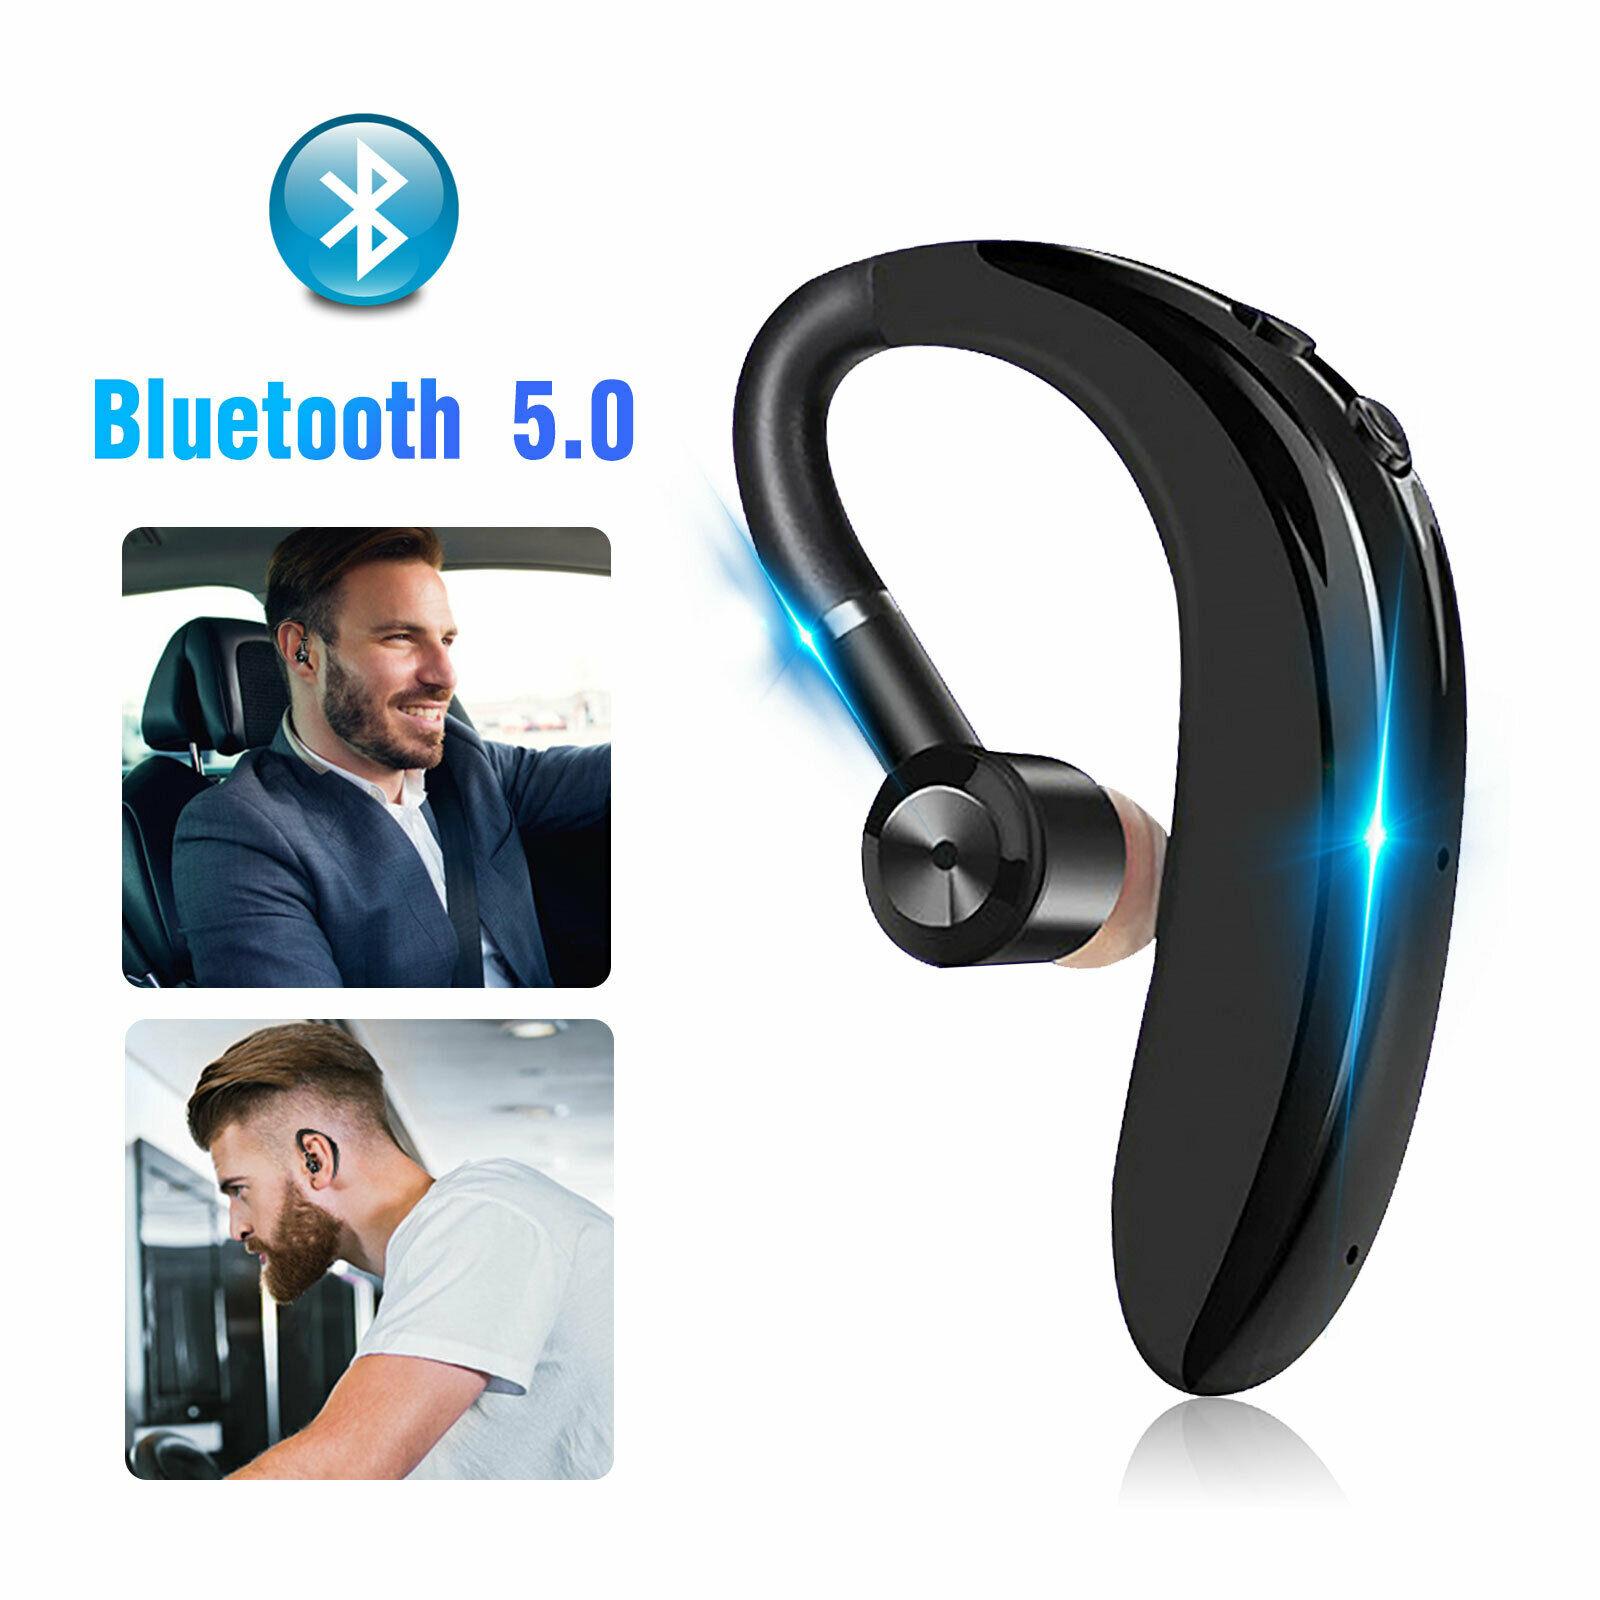 180 Hours Standby Wireless Bluetooth Hands Free Headset Stereo Headphone Earphone